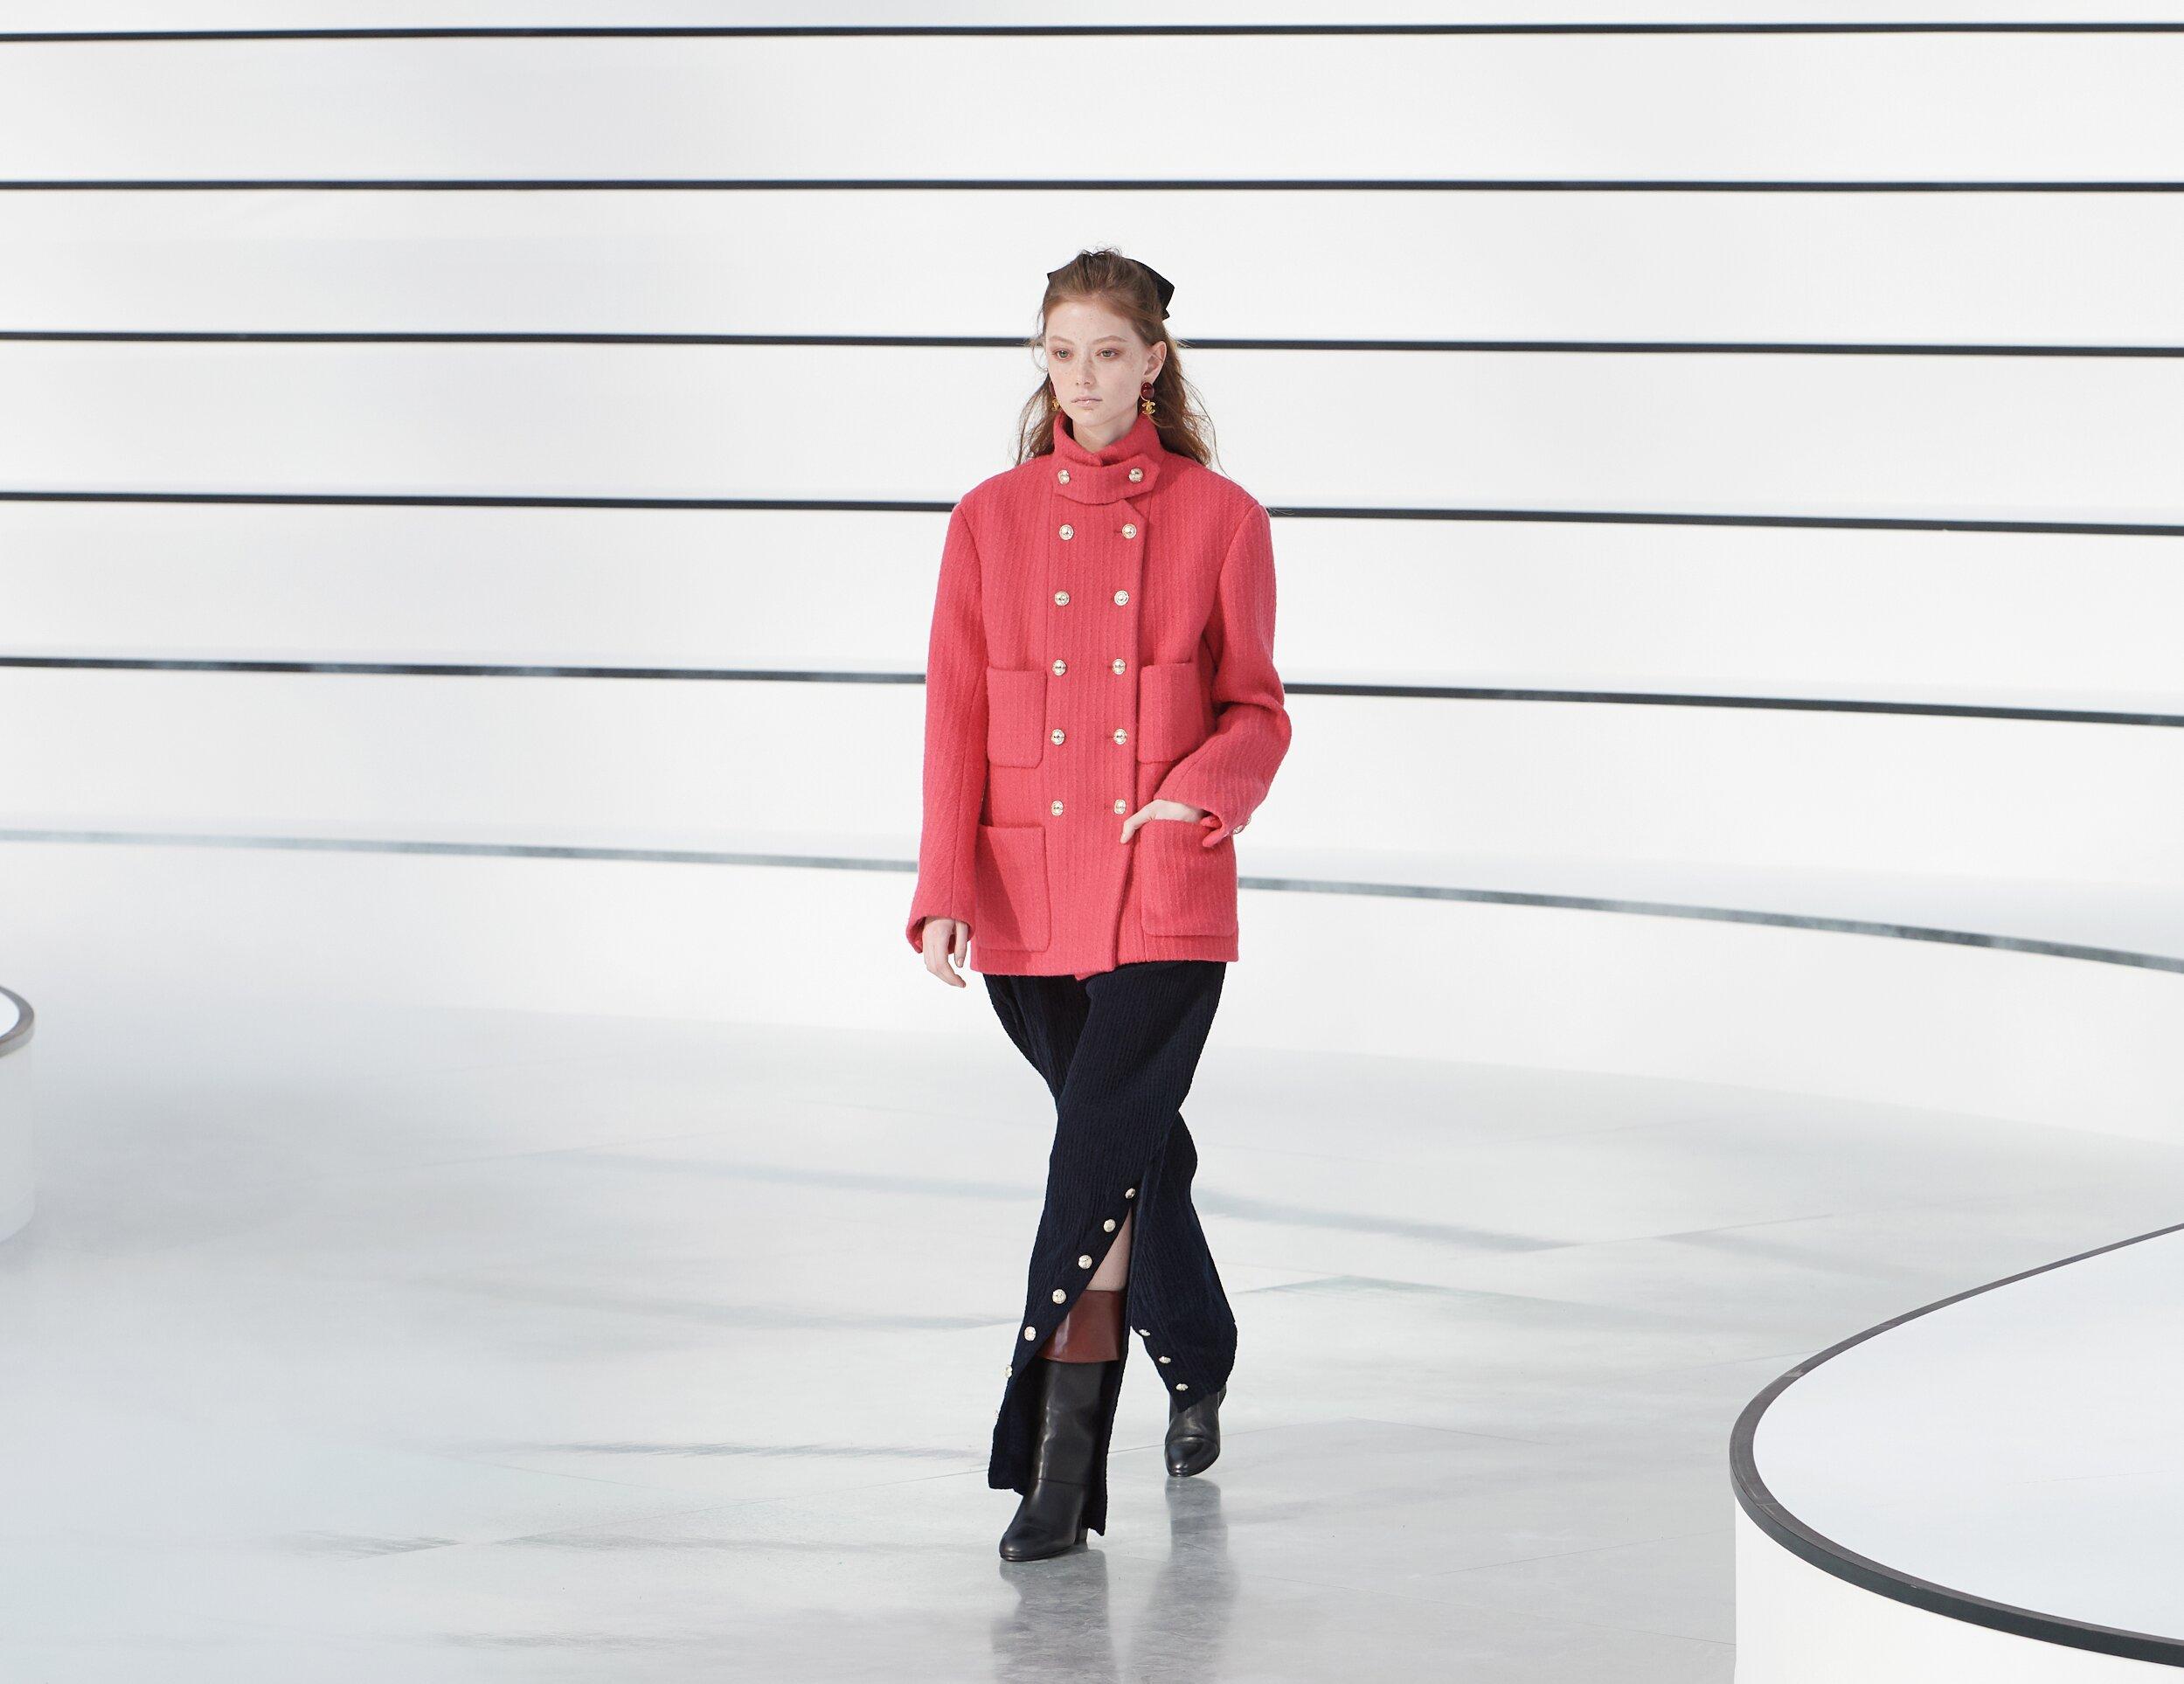 Runway Chanel Fall Winter 2020 Women's Collection Paris Fashion Week